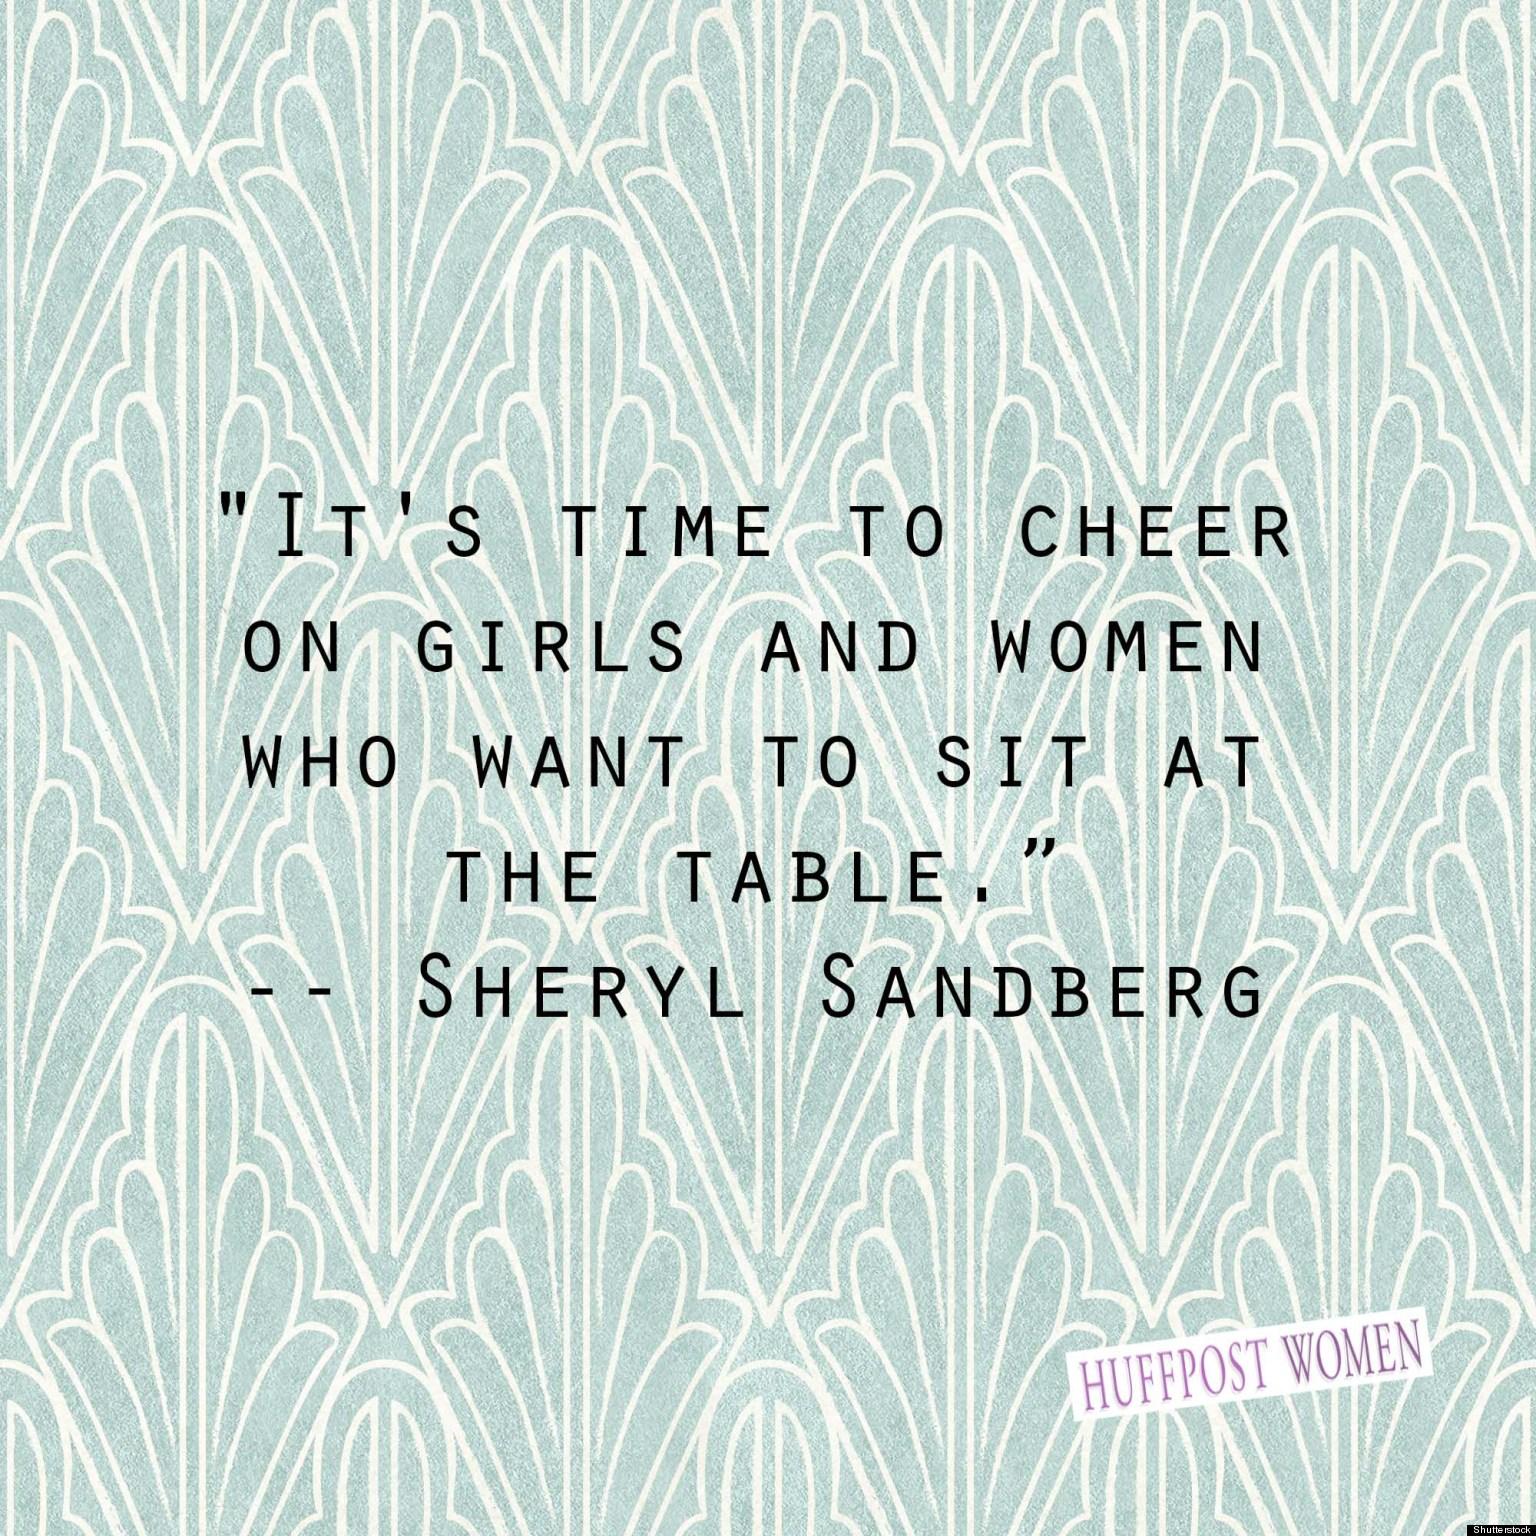 Sheryl Sandberg's quote #8